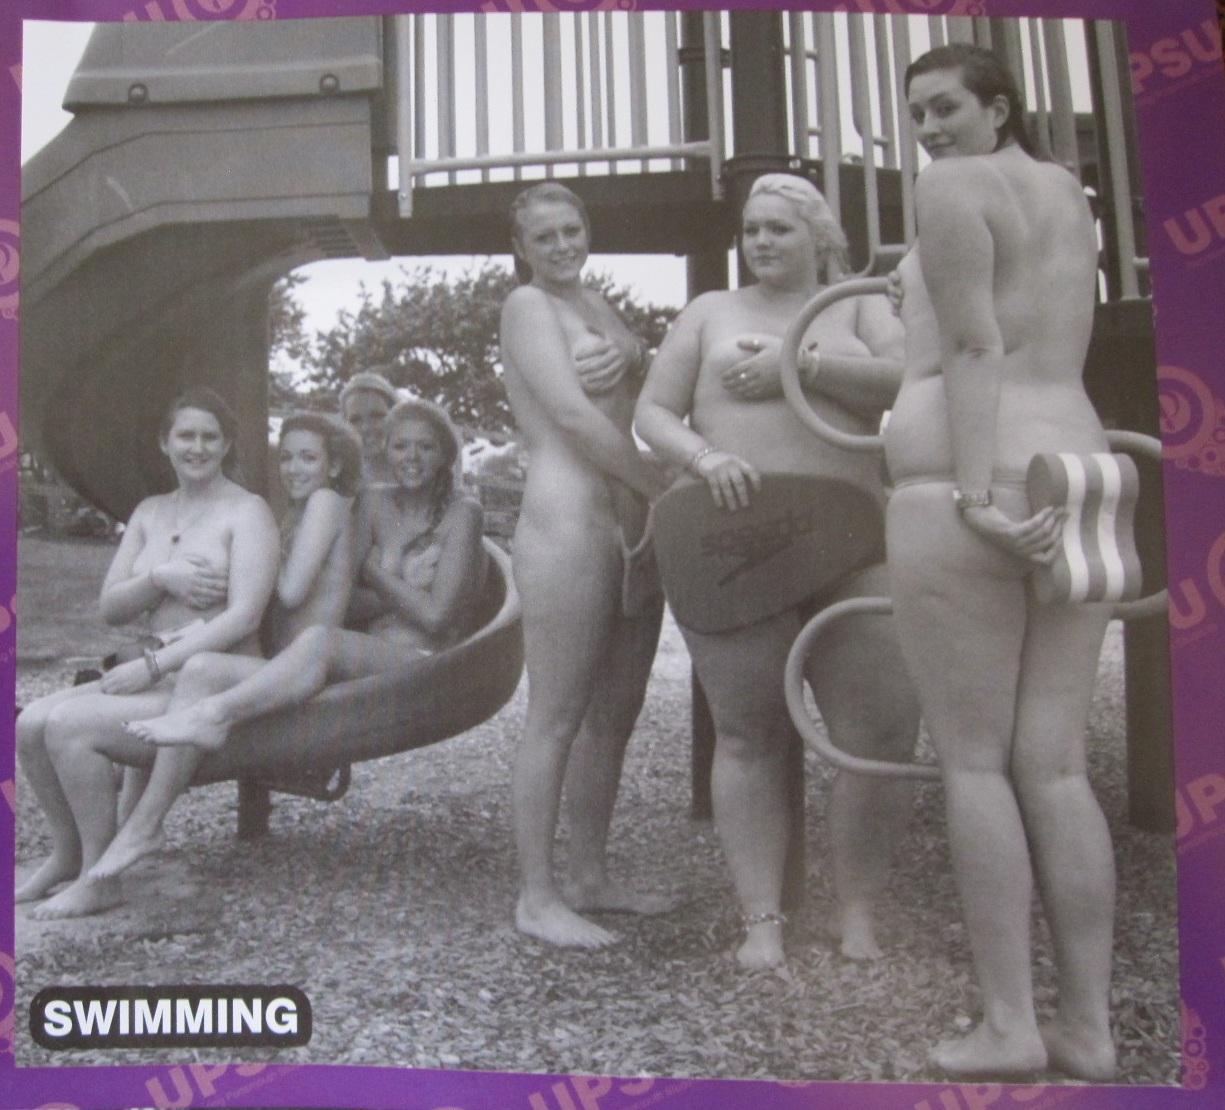 Portsmouth university naked calender